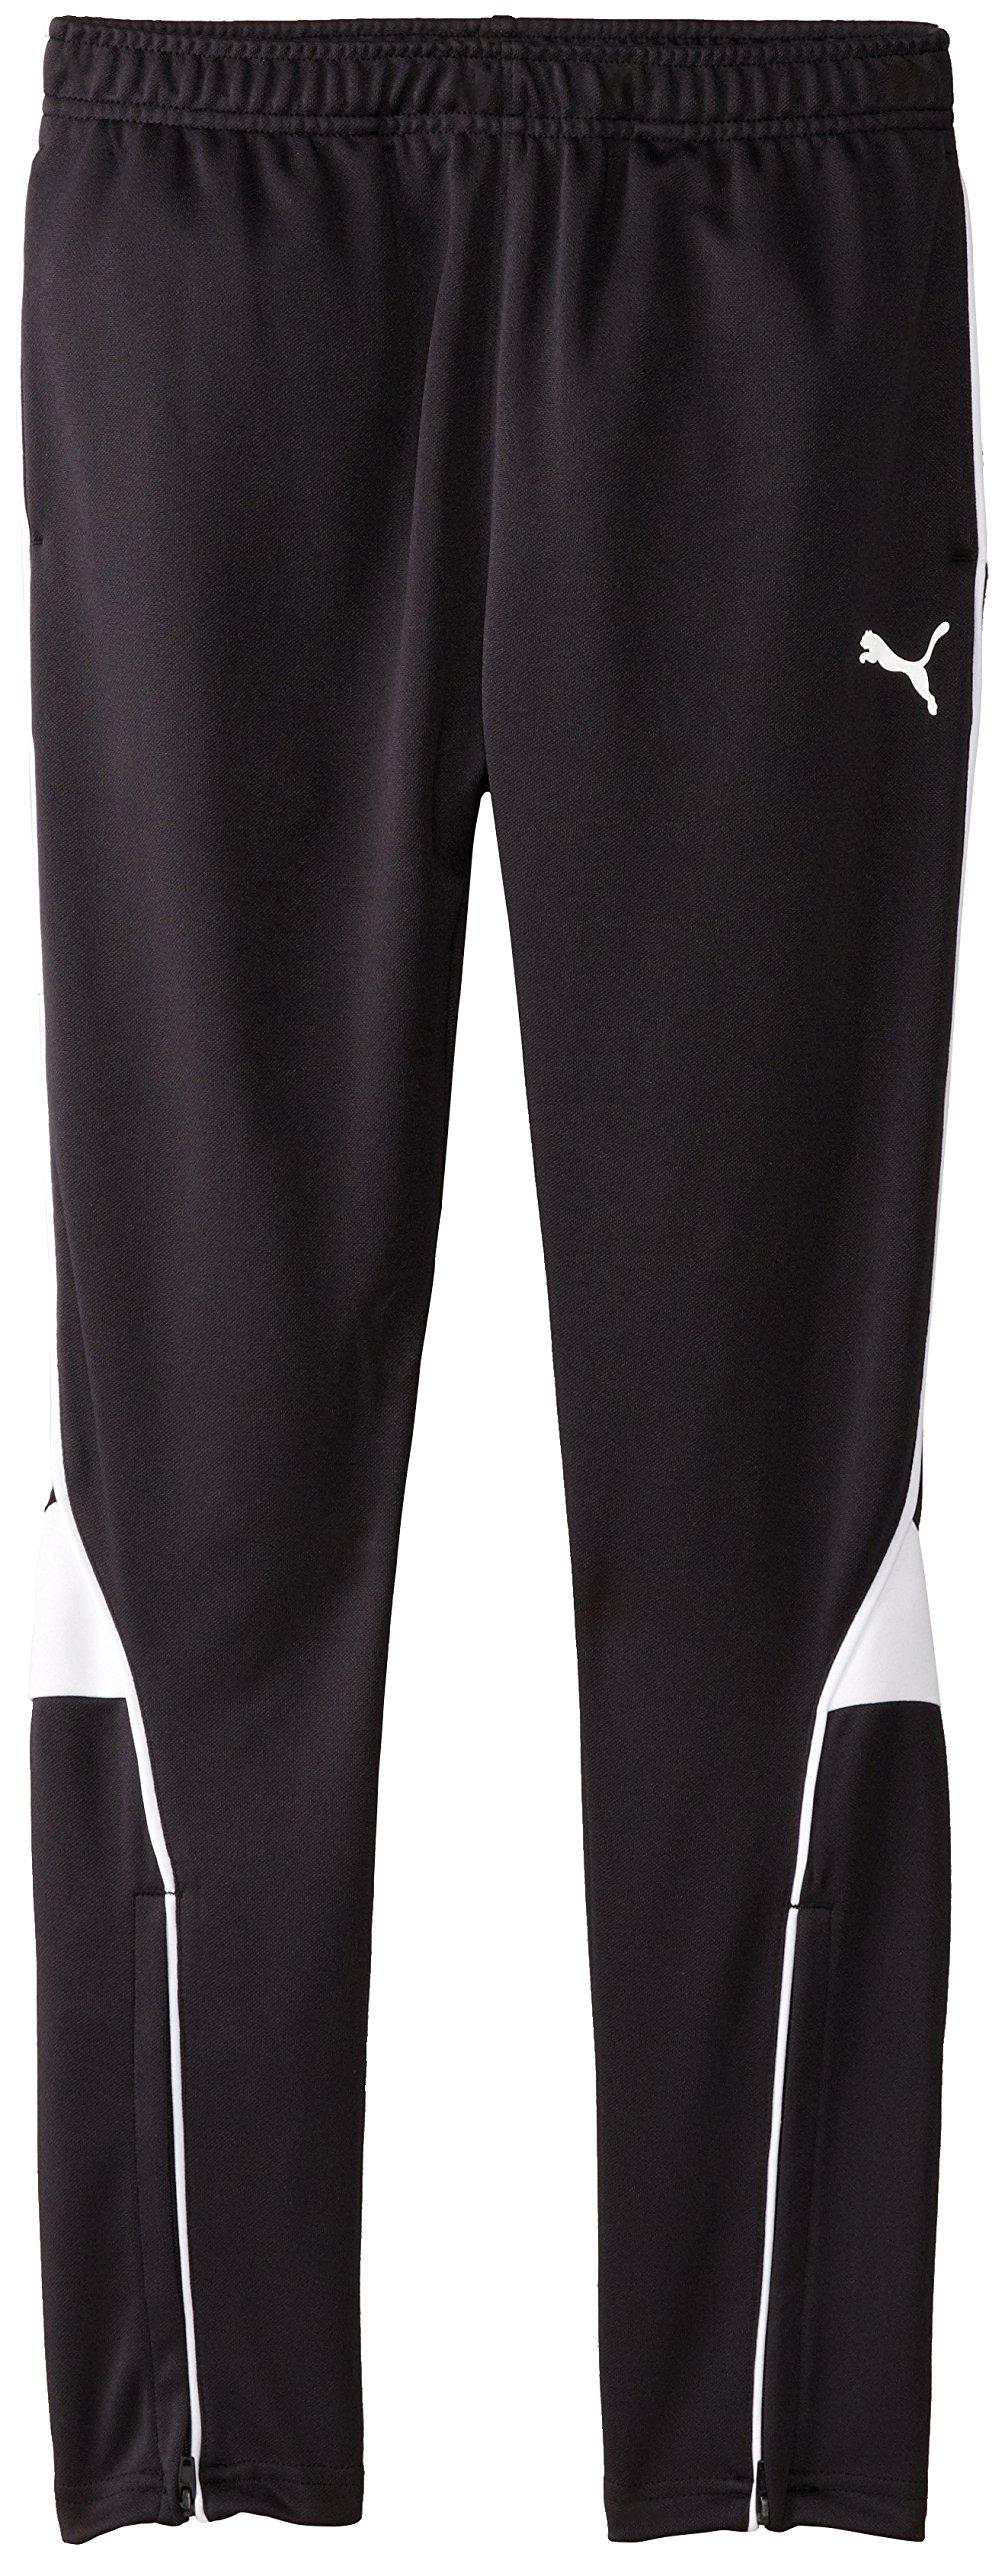 PUMA Big Boys' Pure Core Soccer Pant, Black, Medium